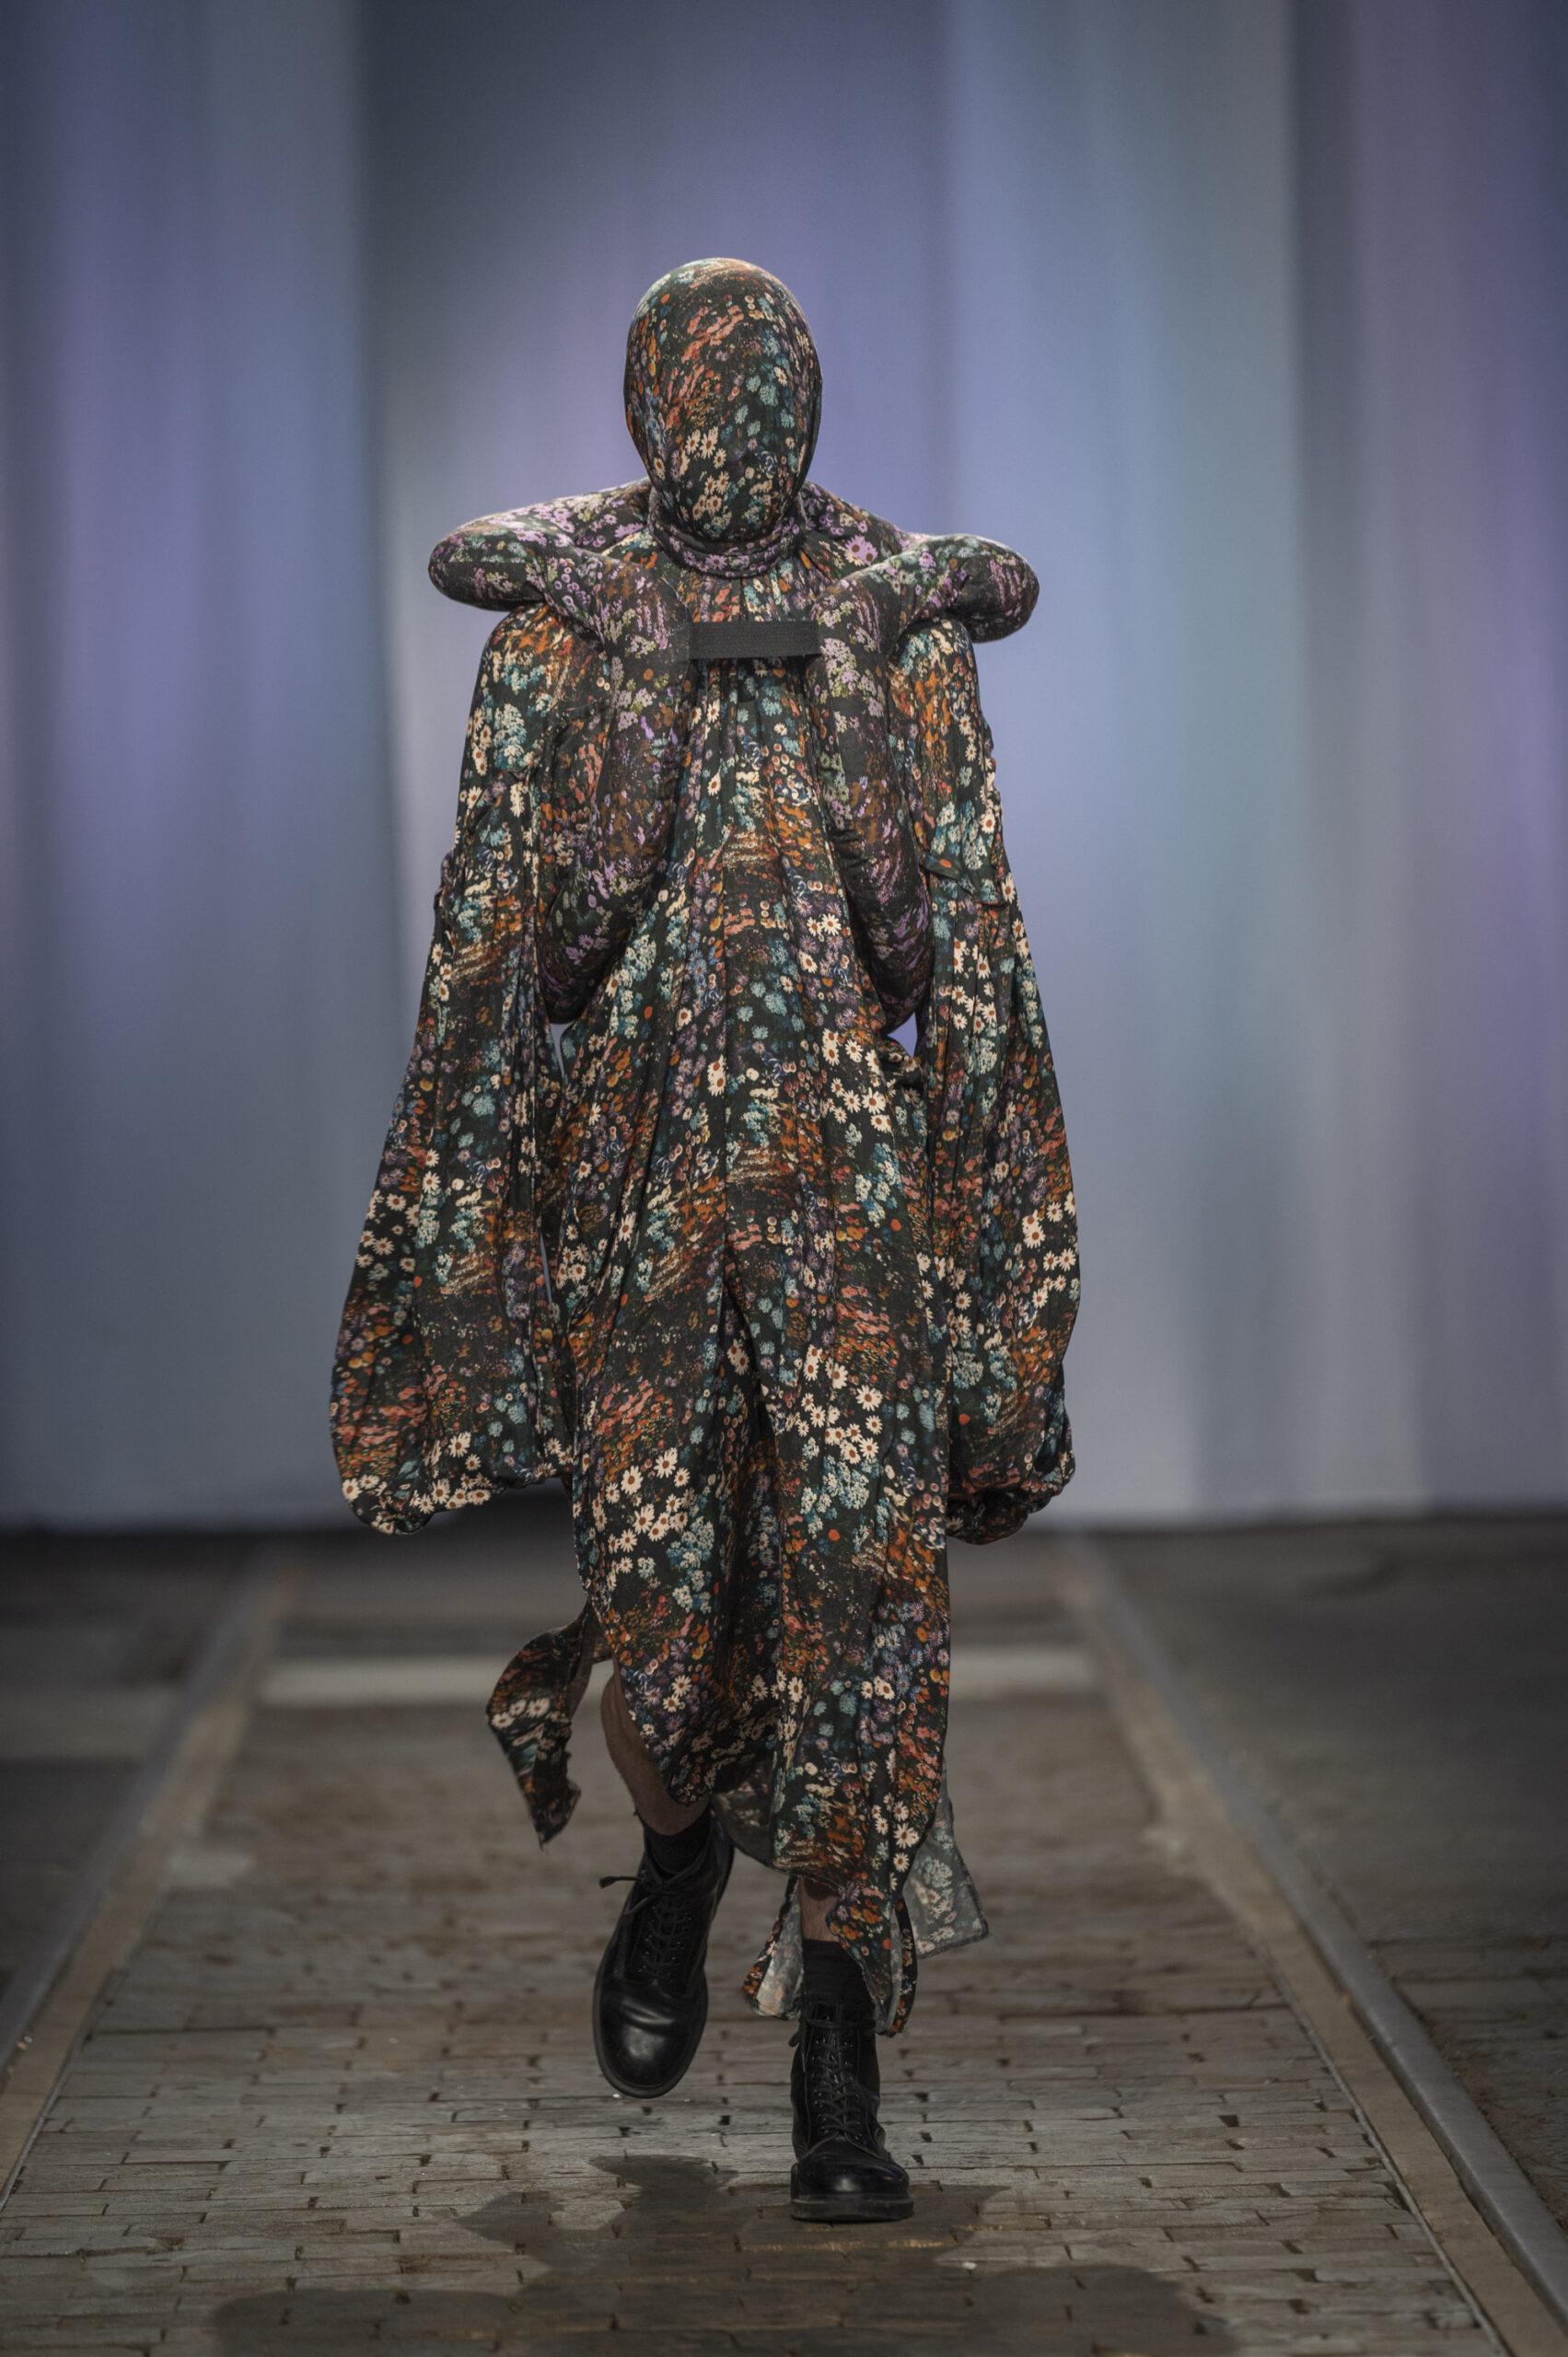 F+F Modedesign Zürich. all clothing. Vladislav Rüegger